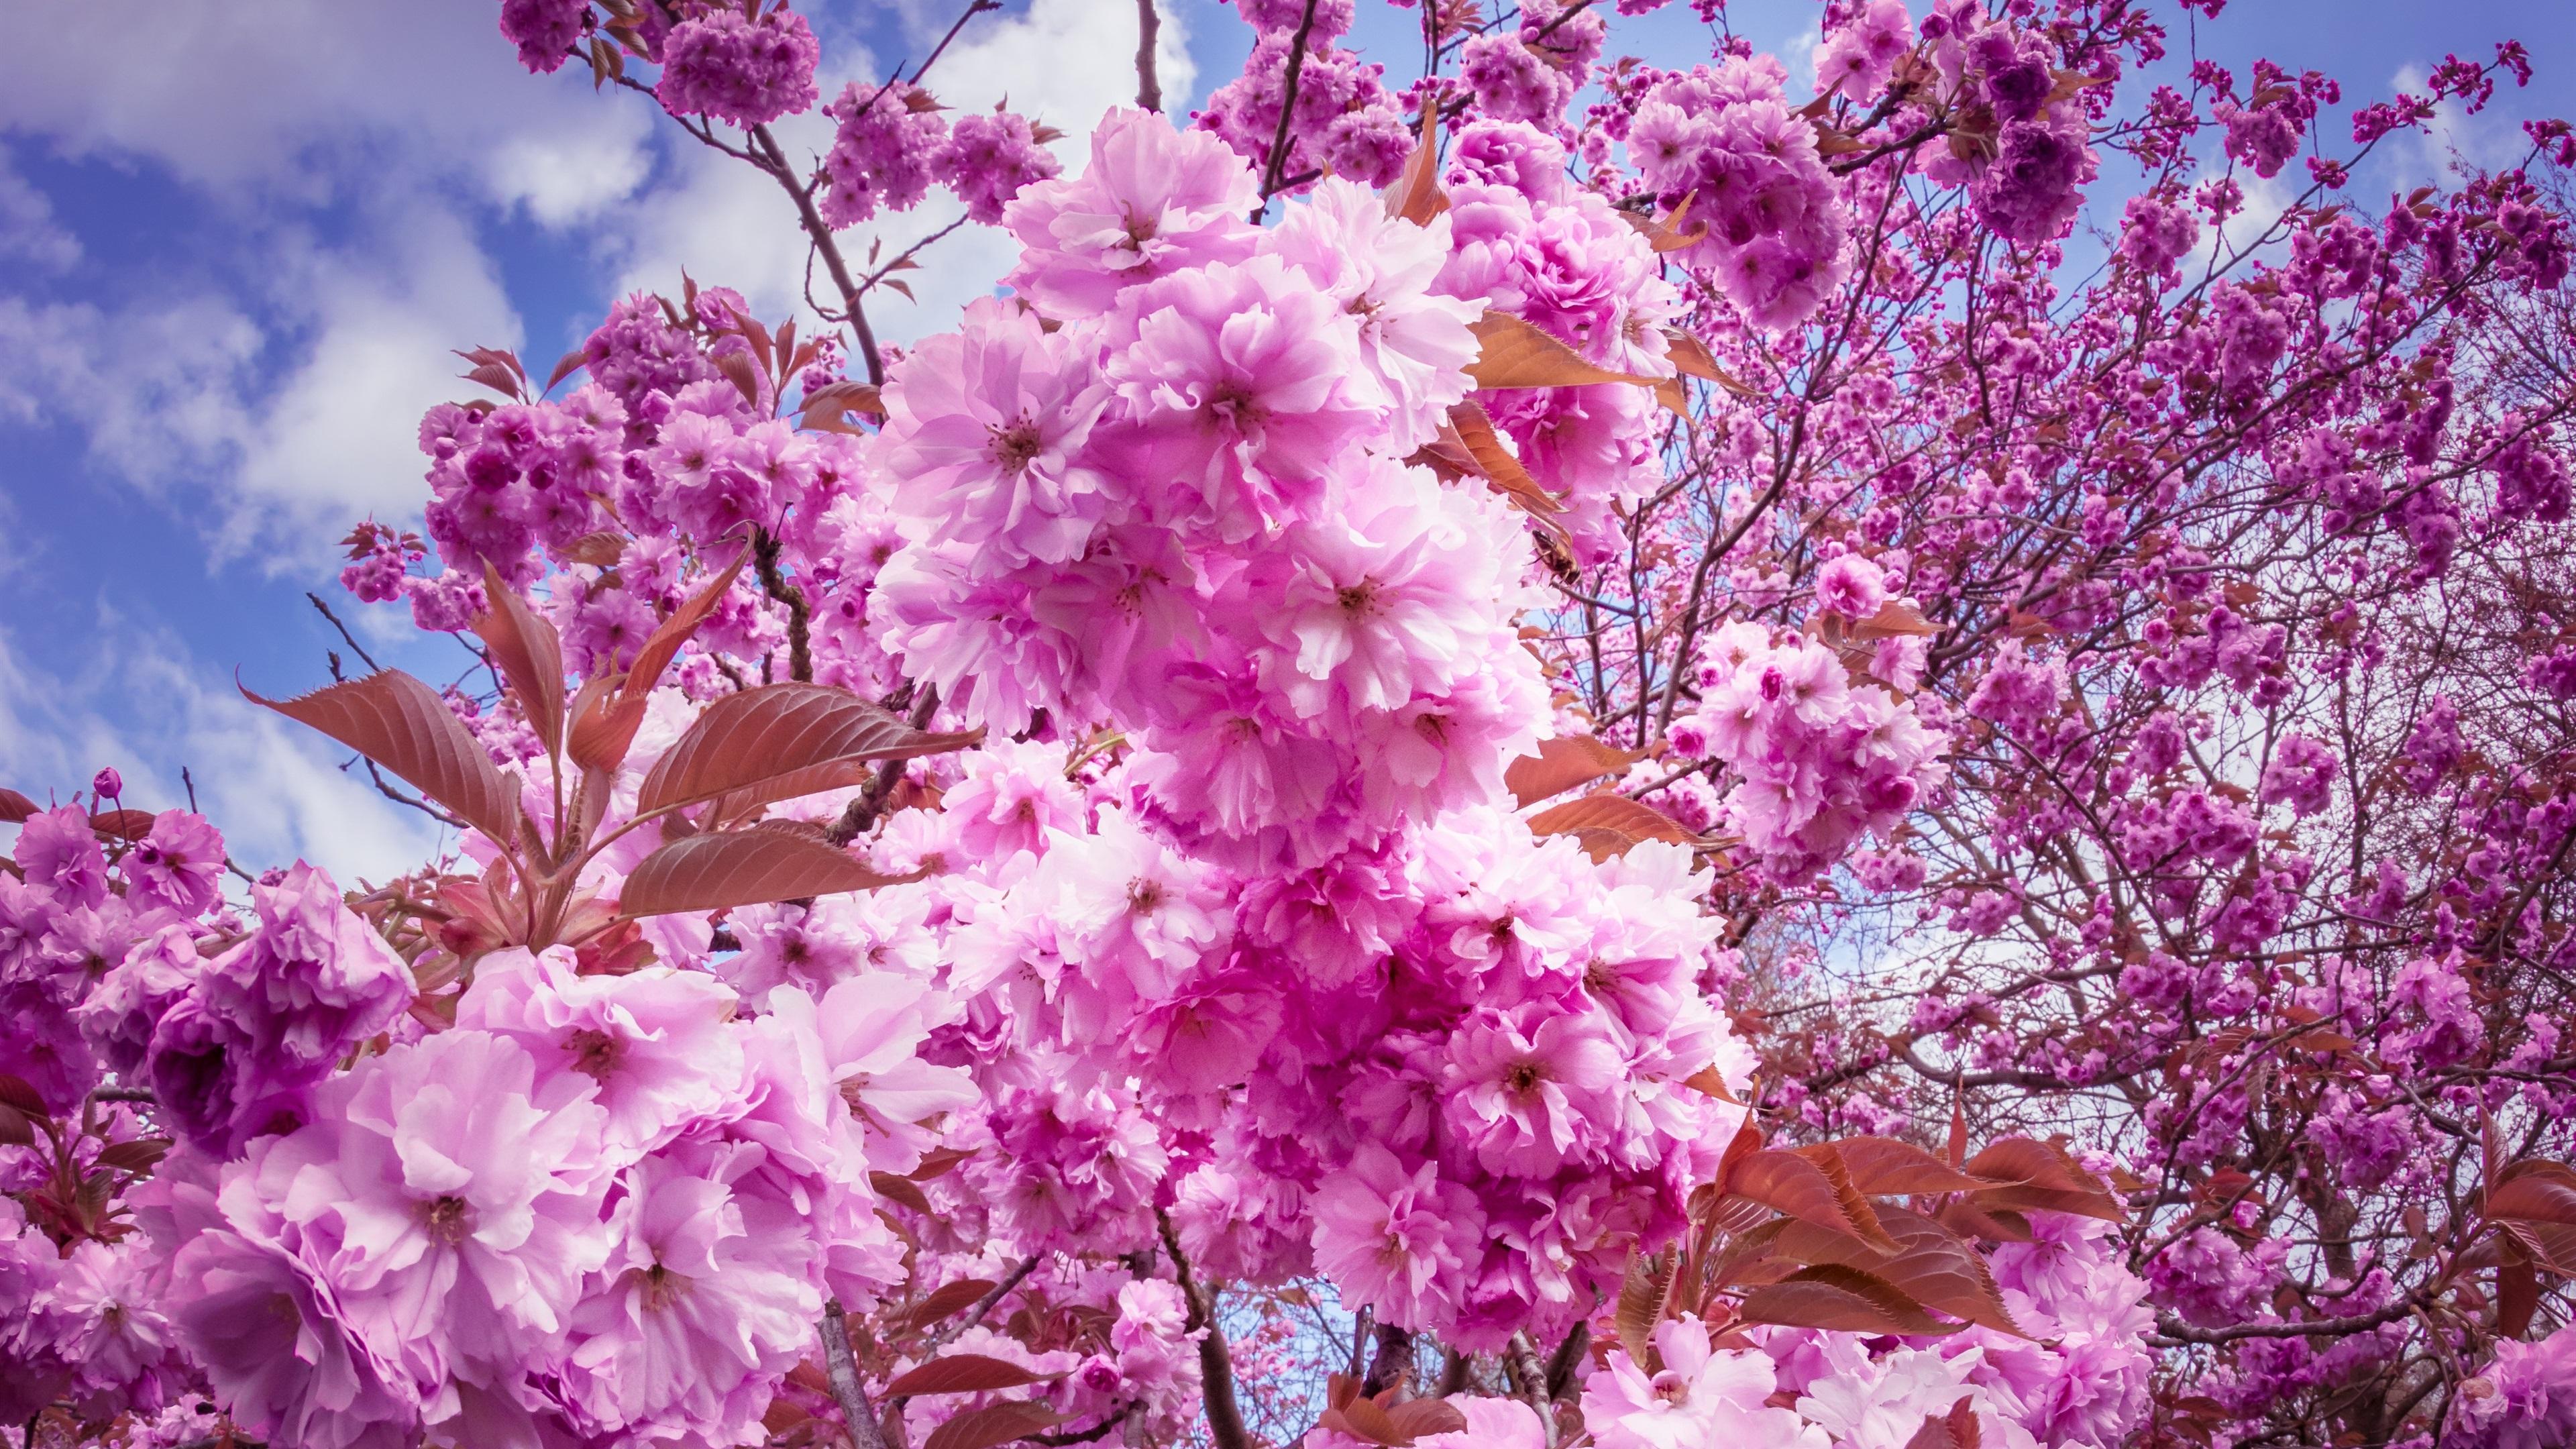 Fleurs De Printemps Fleurissent 4k Fonds D Ecran Fonds D